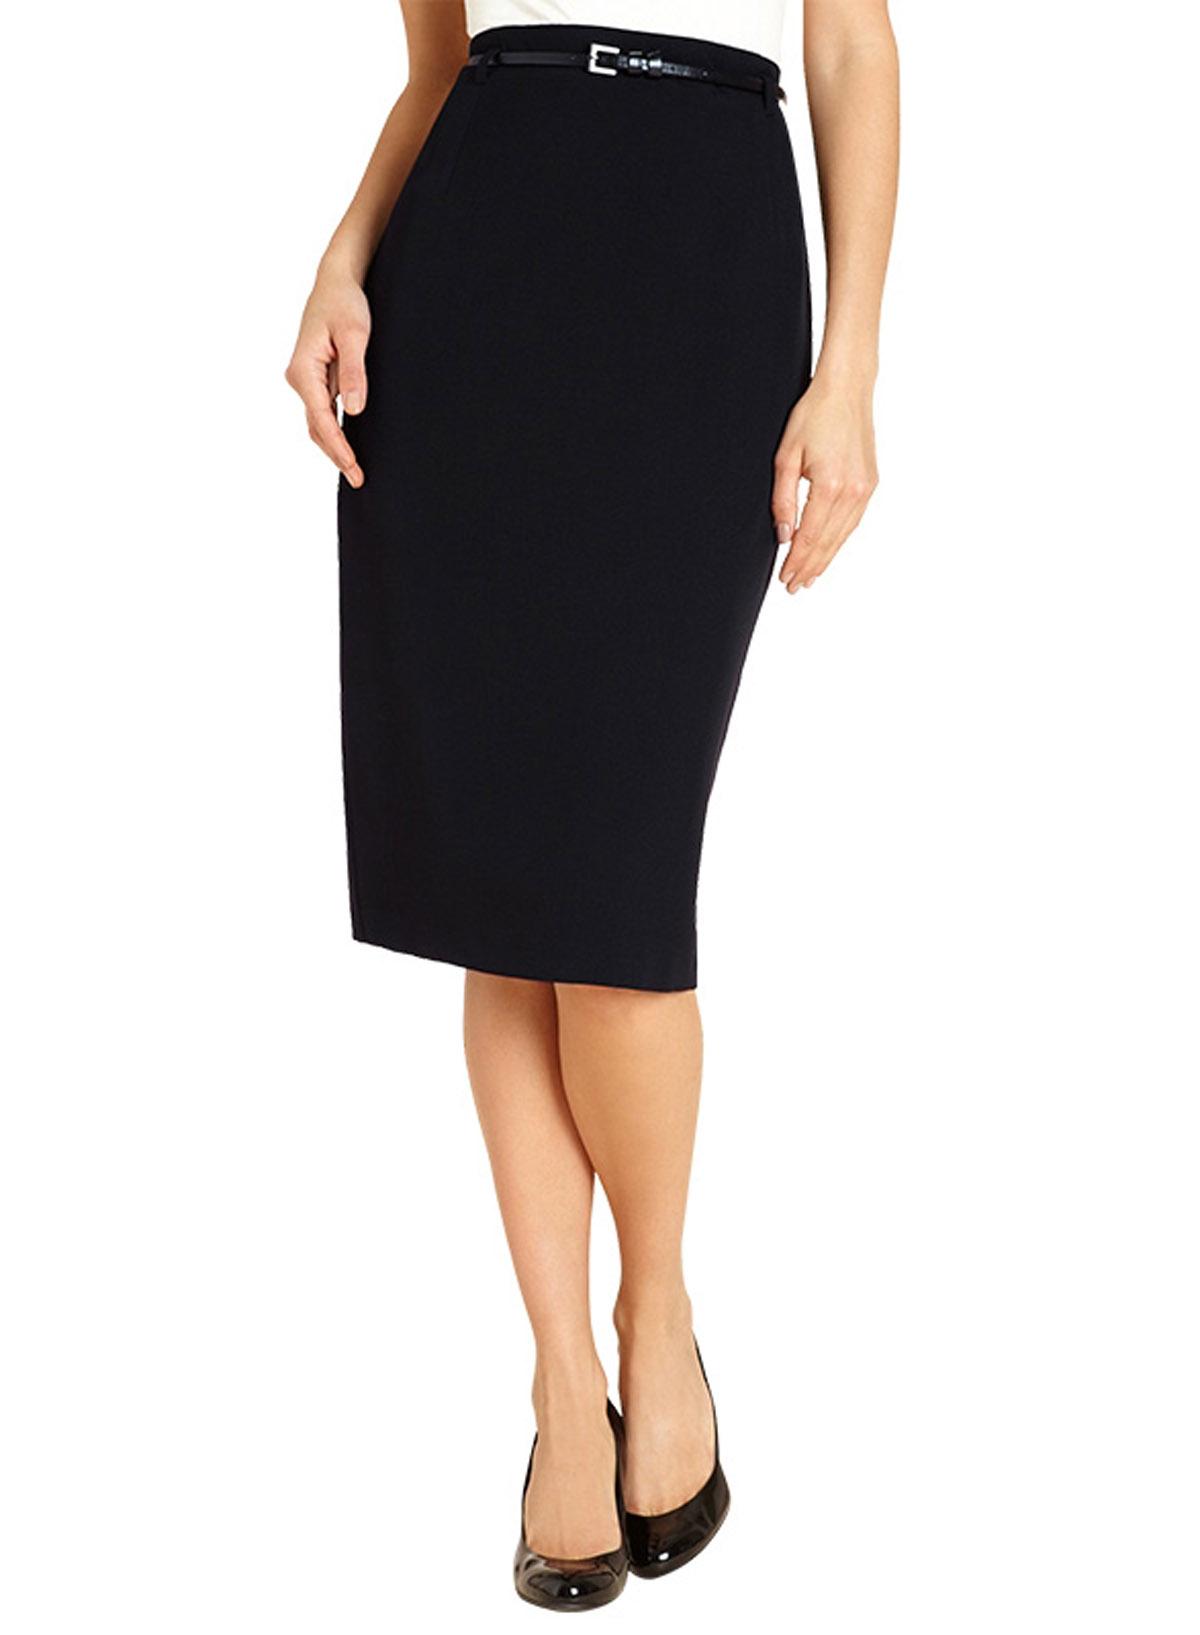 marks and spencer m 5 black belted pencil skirt size